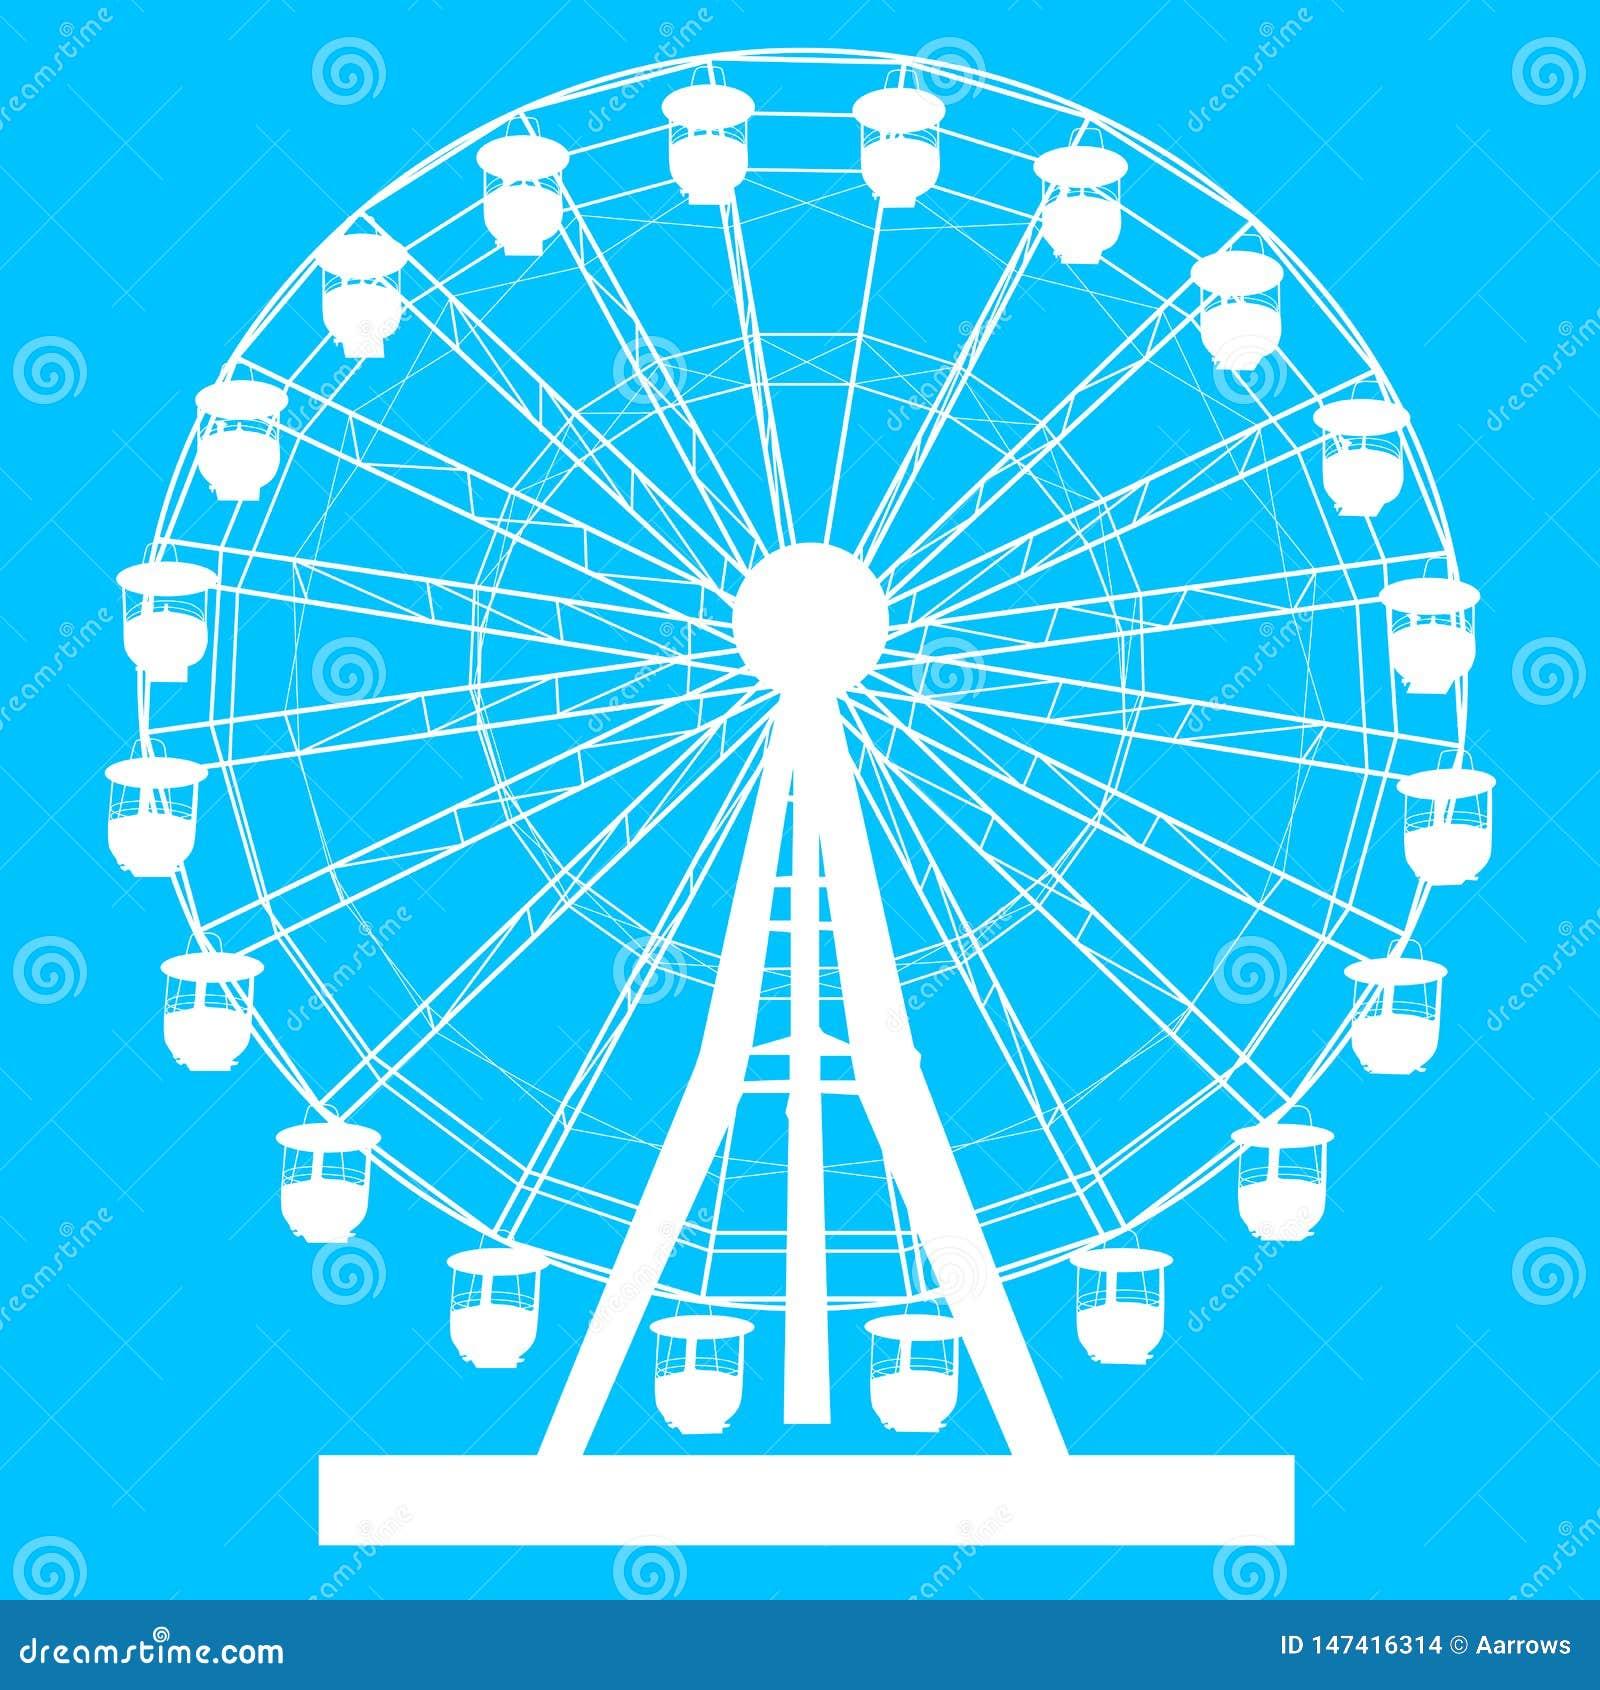 Silhouette atraktsion colorful ferris wheel on blue background illustration